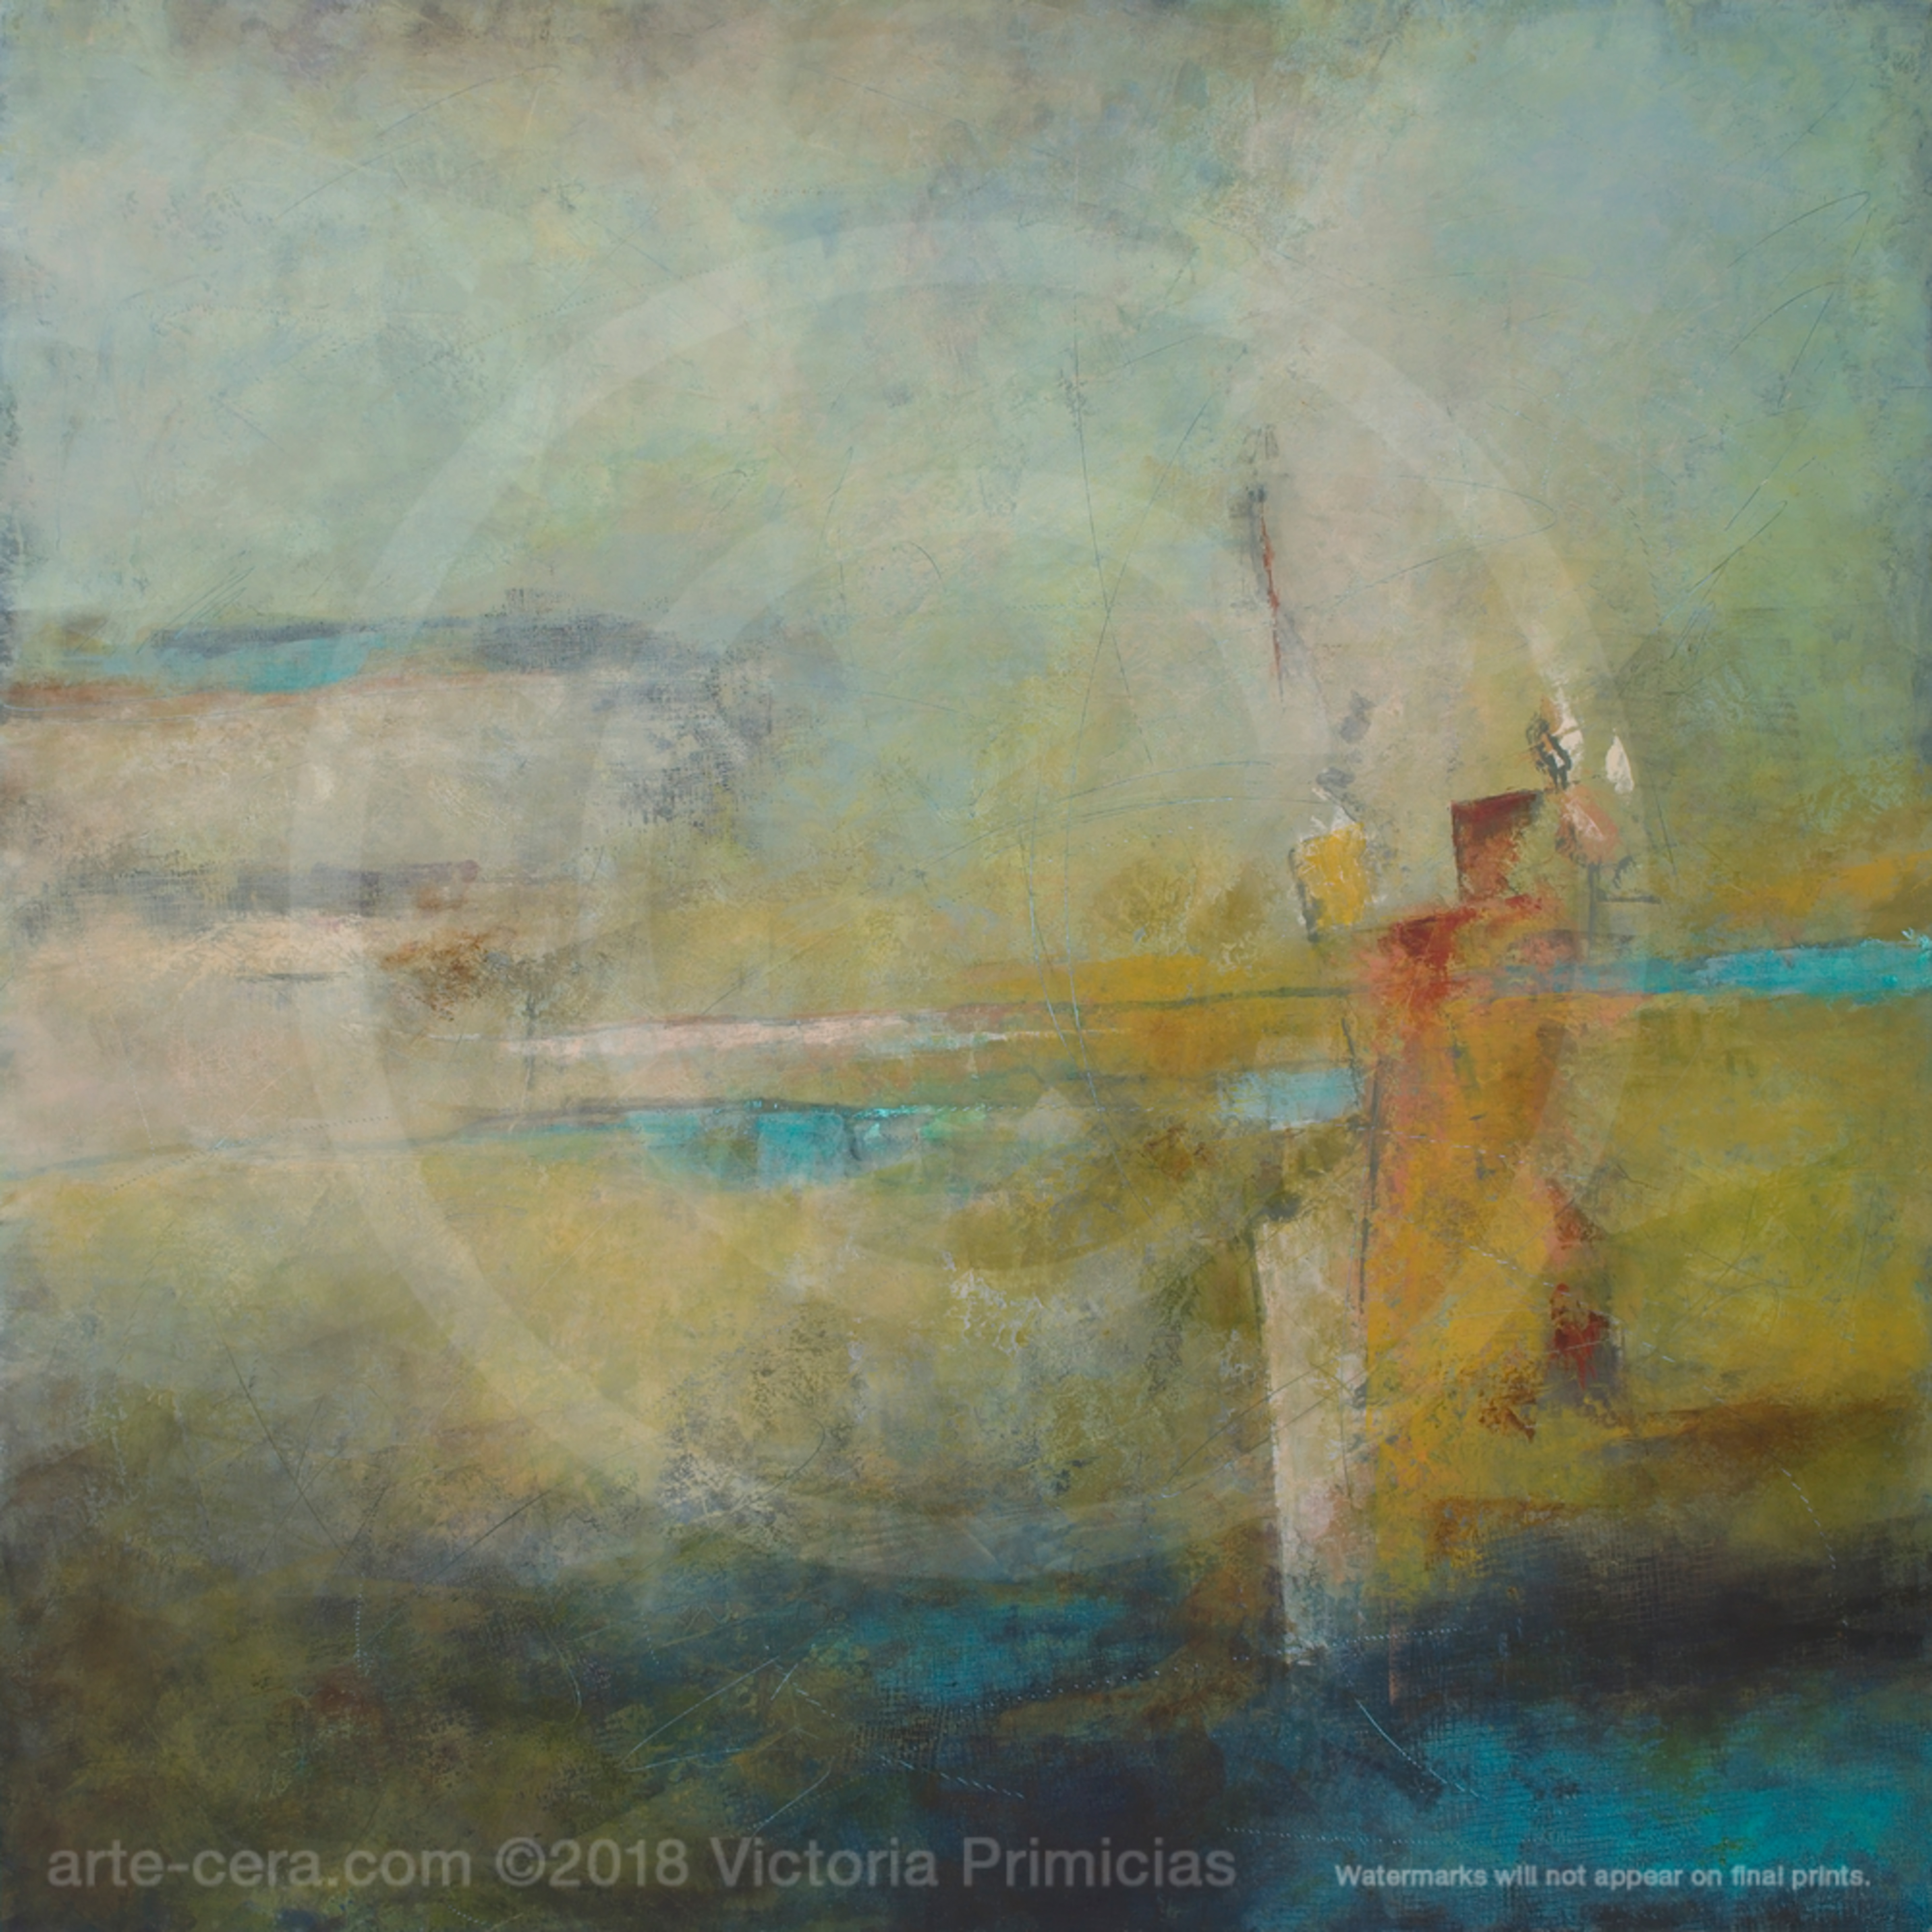 Abstract art images siren song ehxjpa